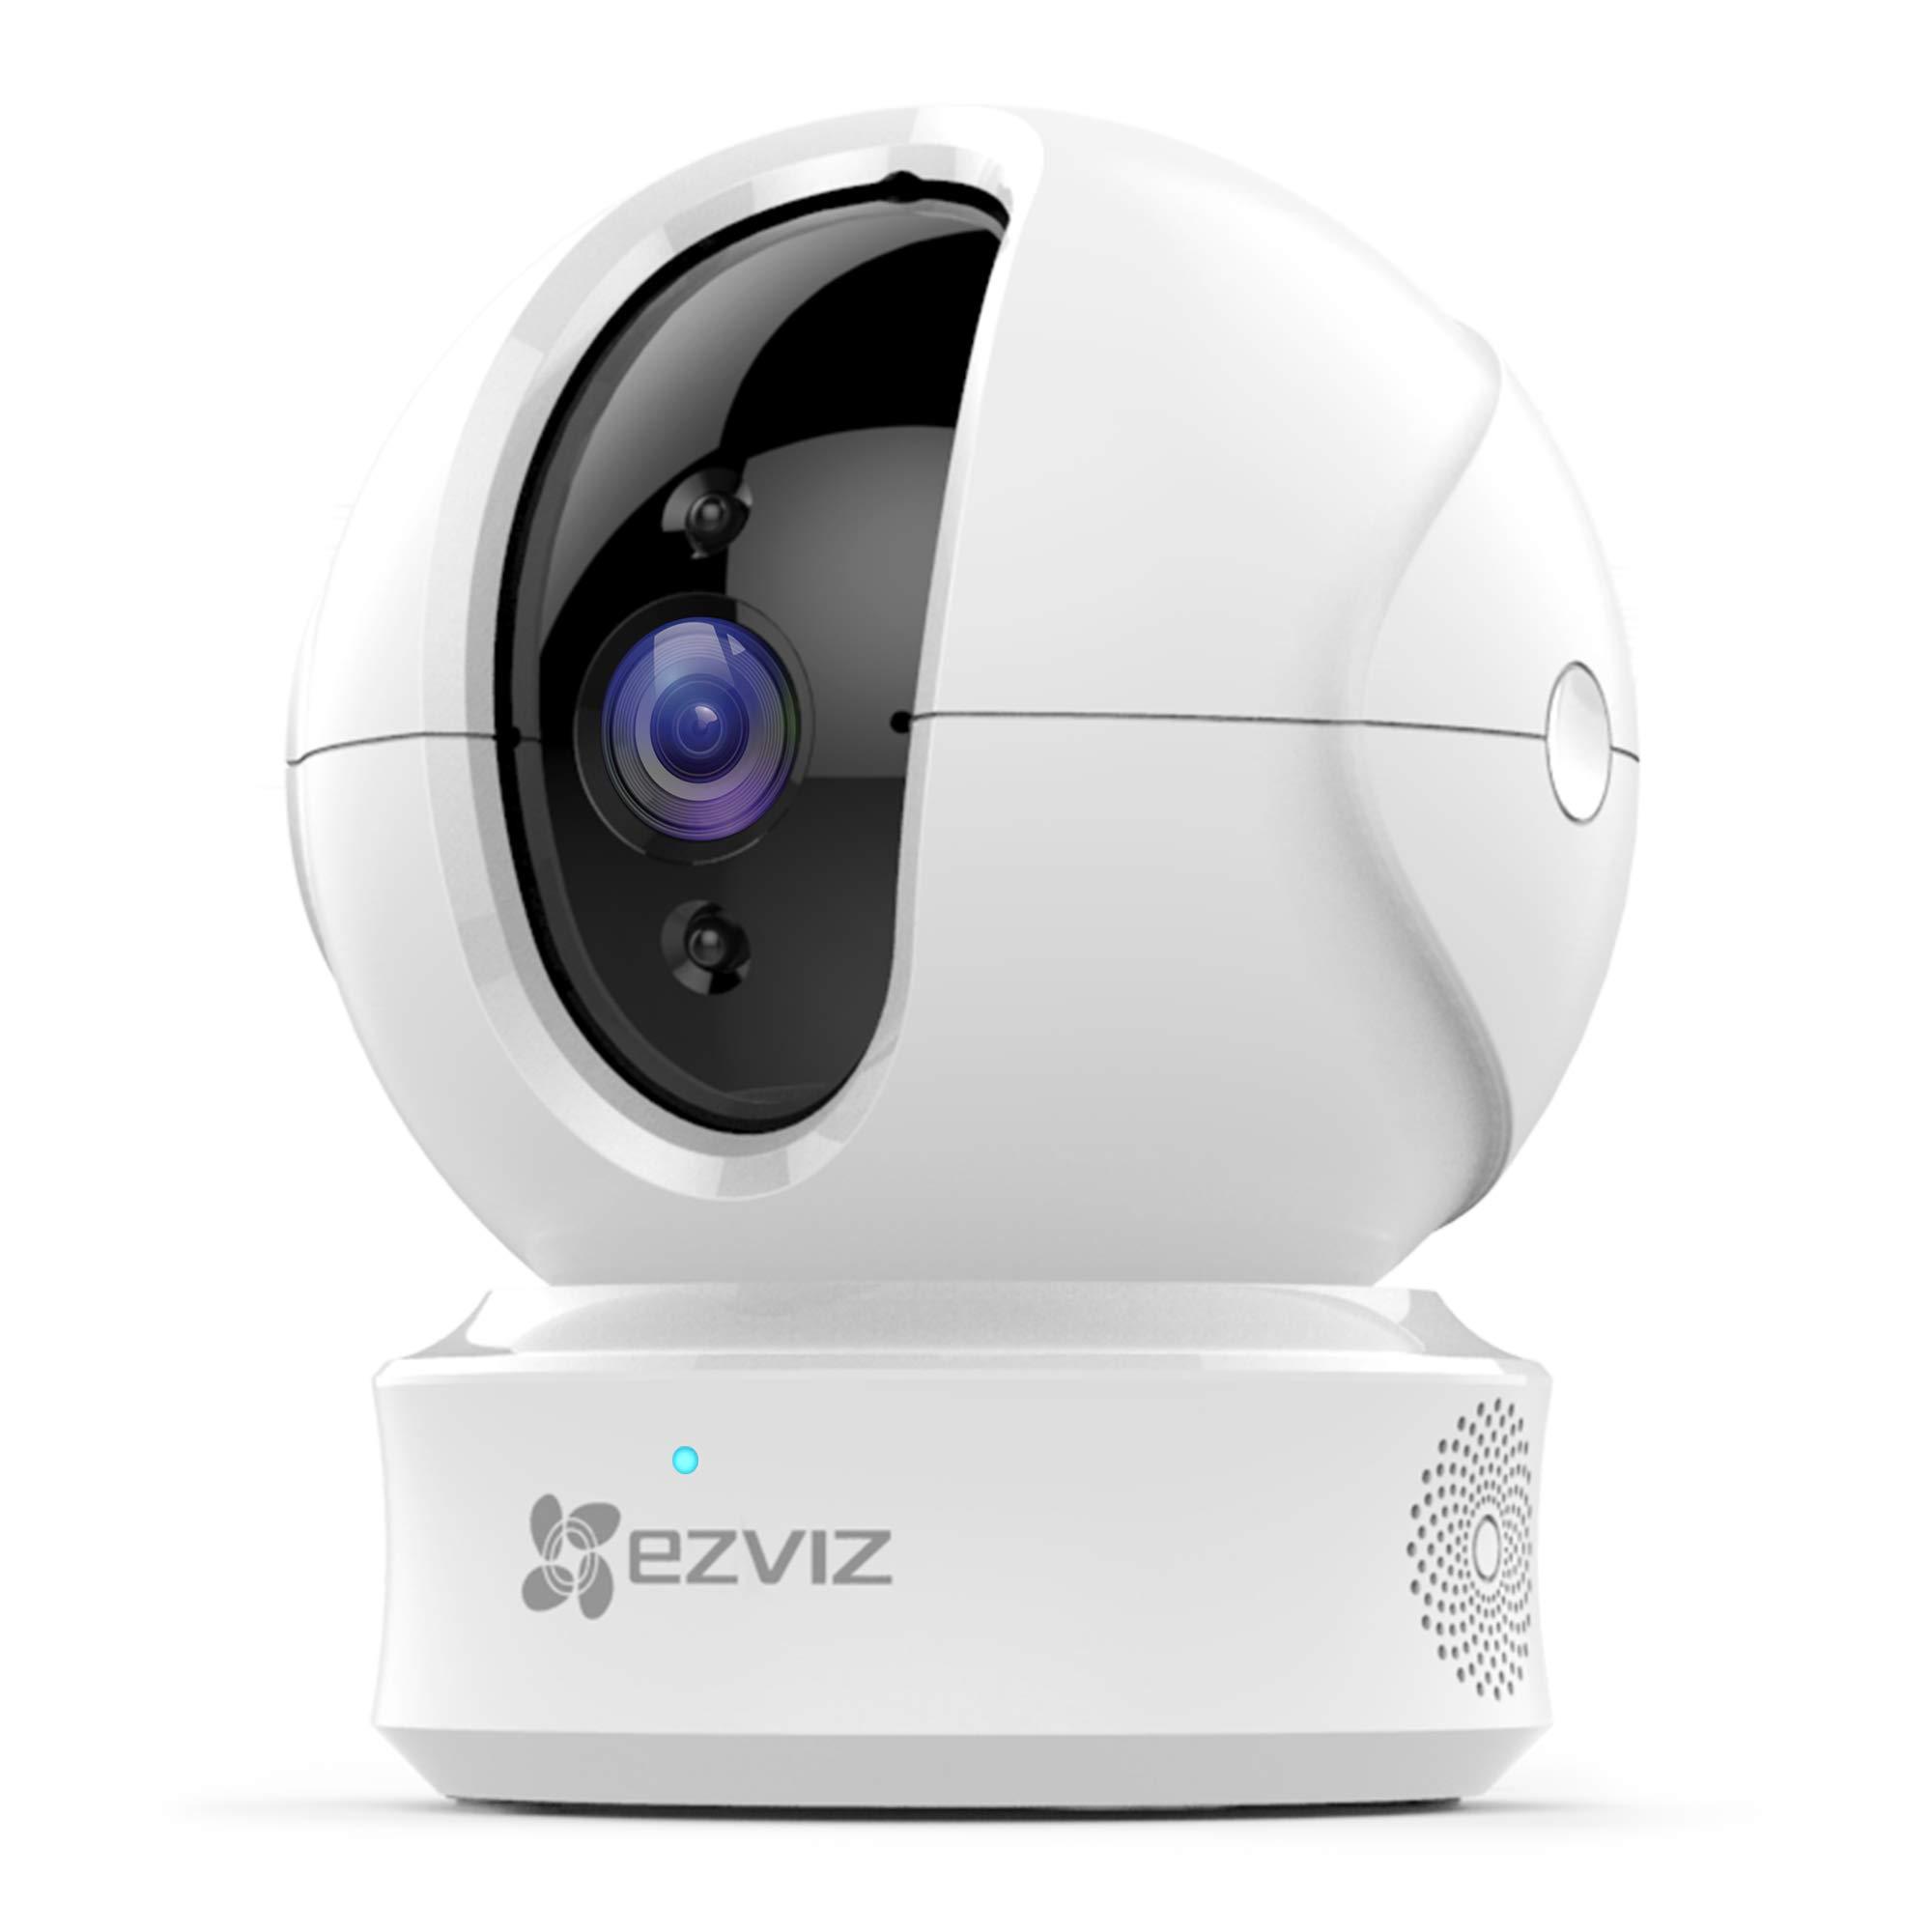 EZVIZ C6T Motorized Internal Wi-Fi Camera, White - Buy Online in KSA